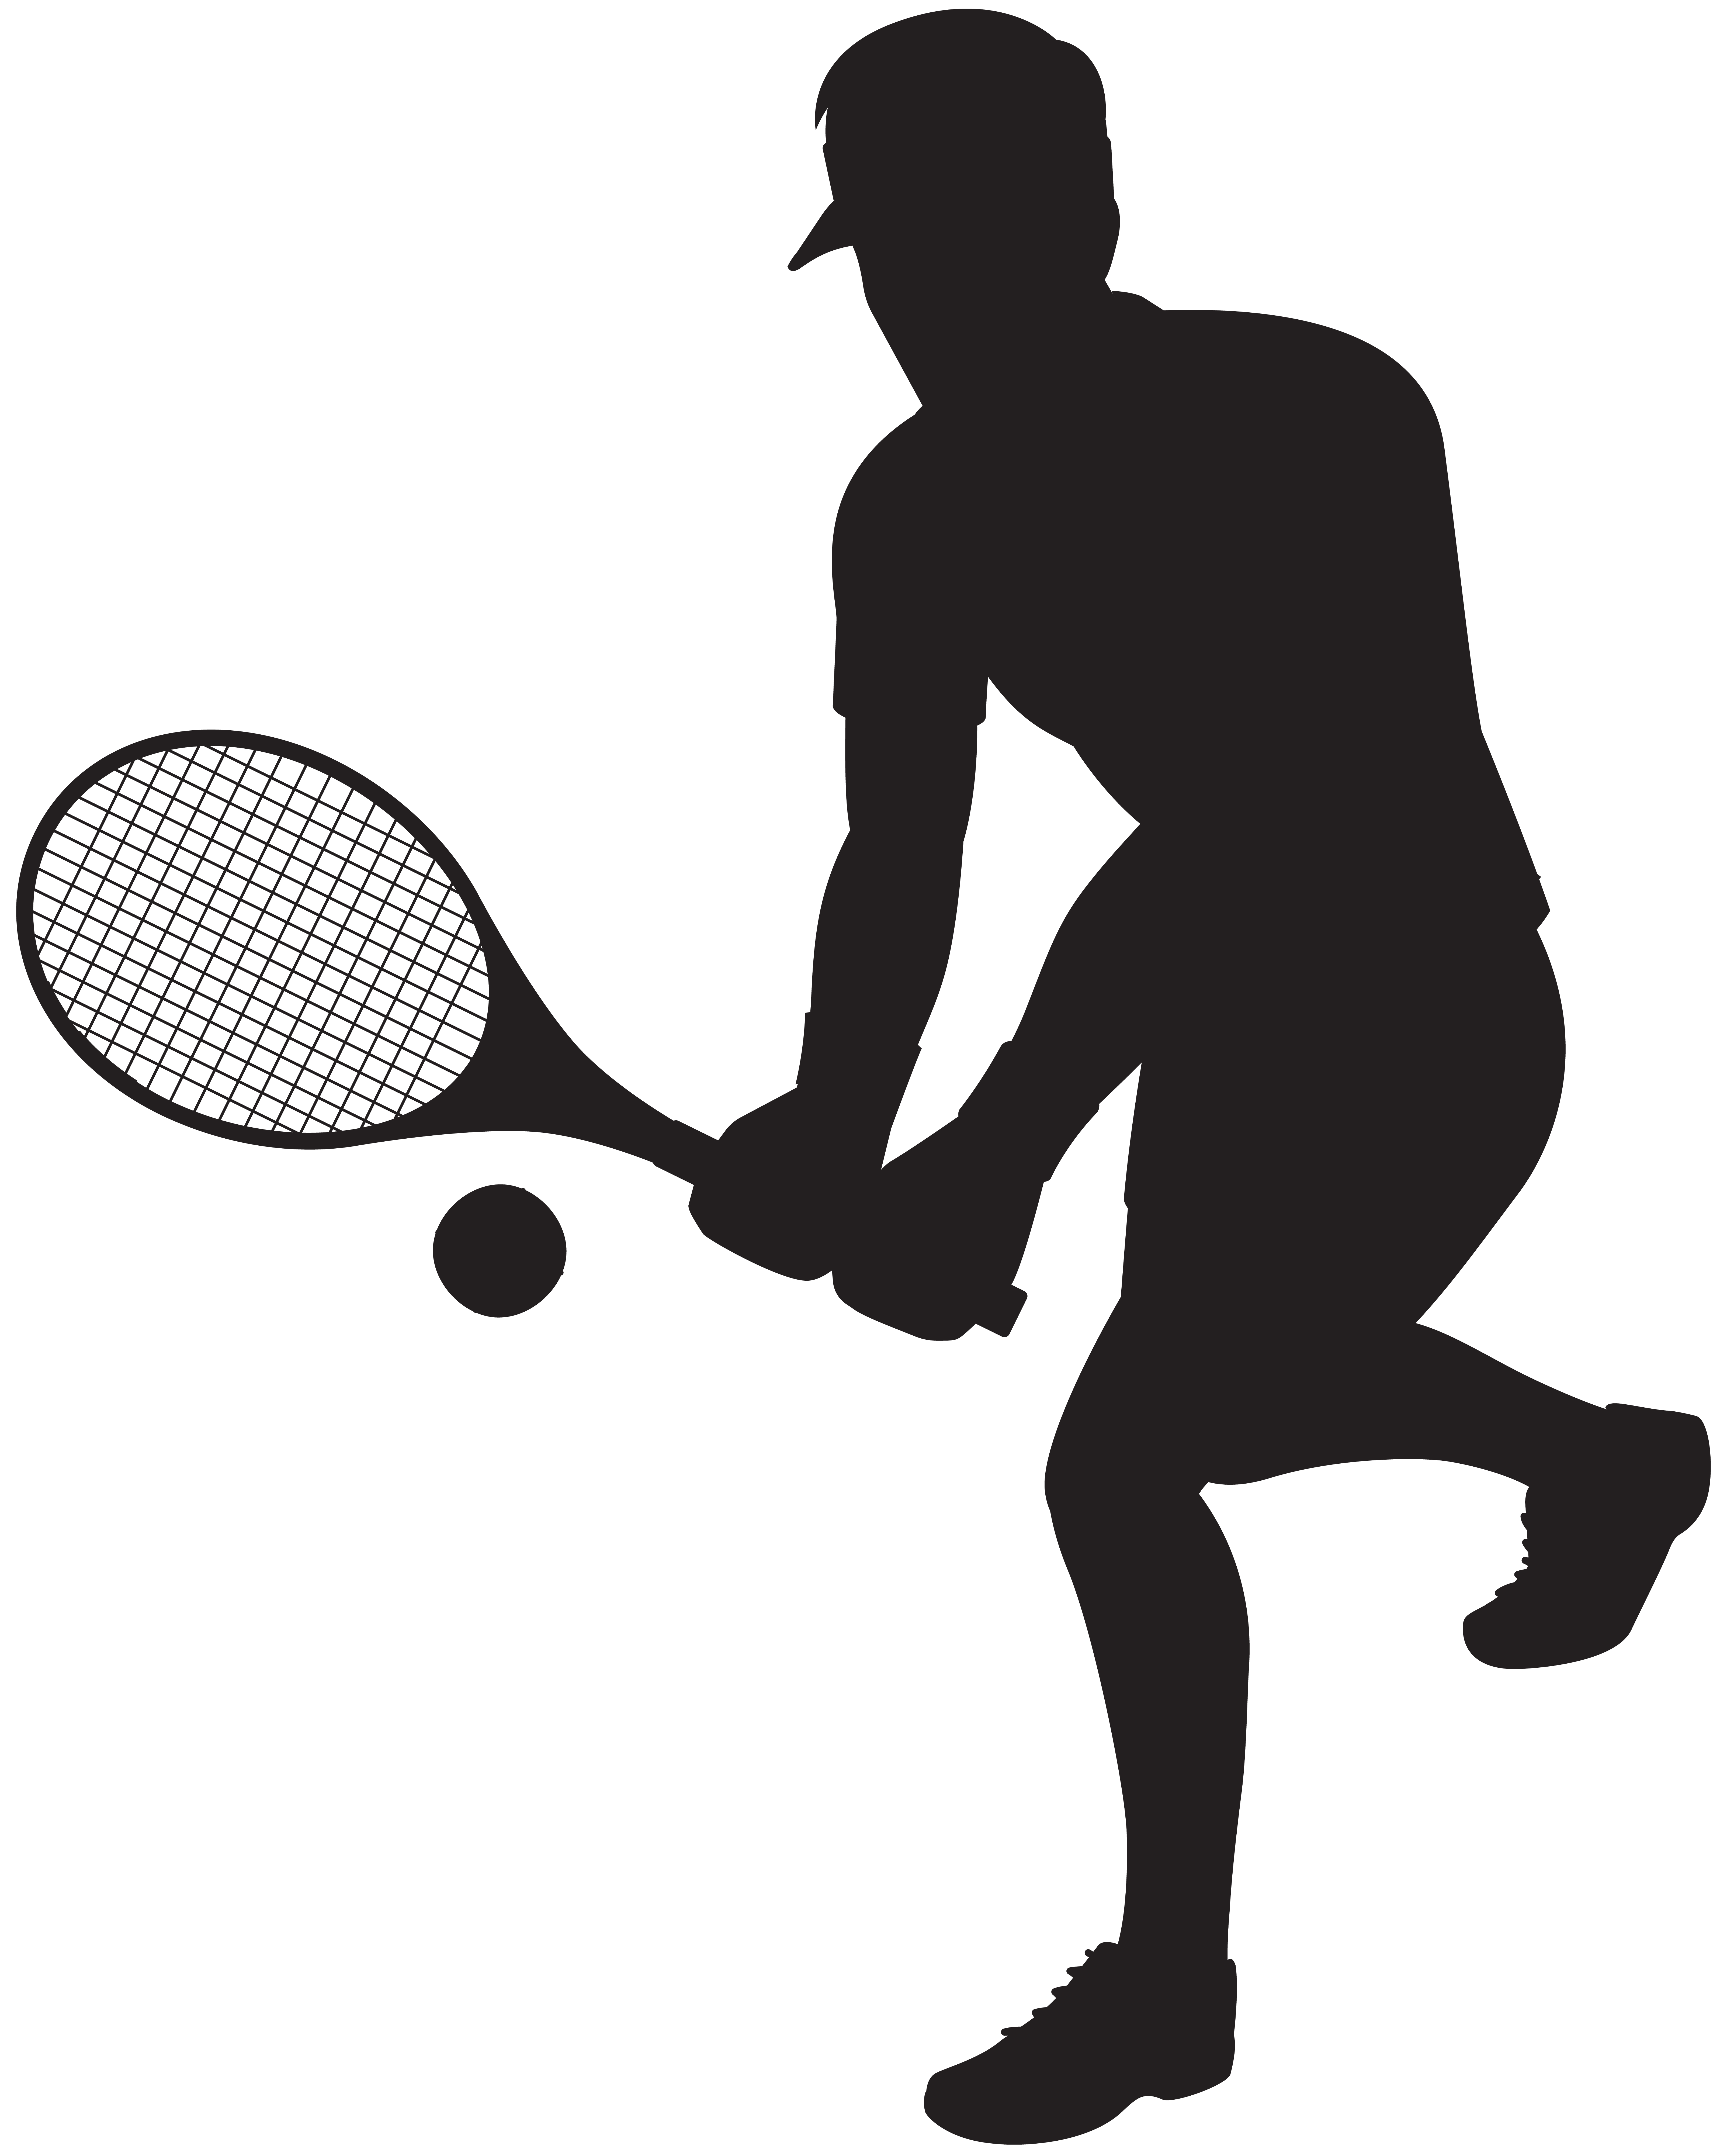 Tennis Player Silhouette Clip Art Image.